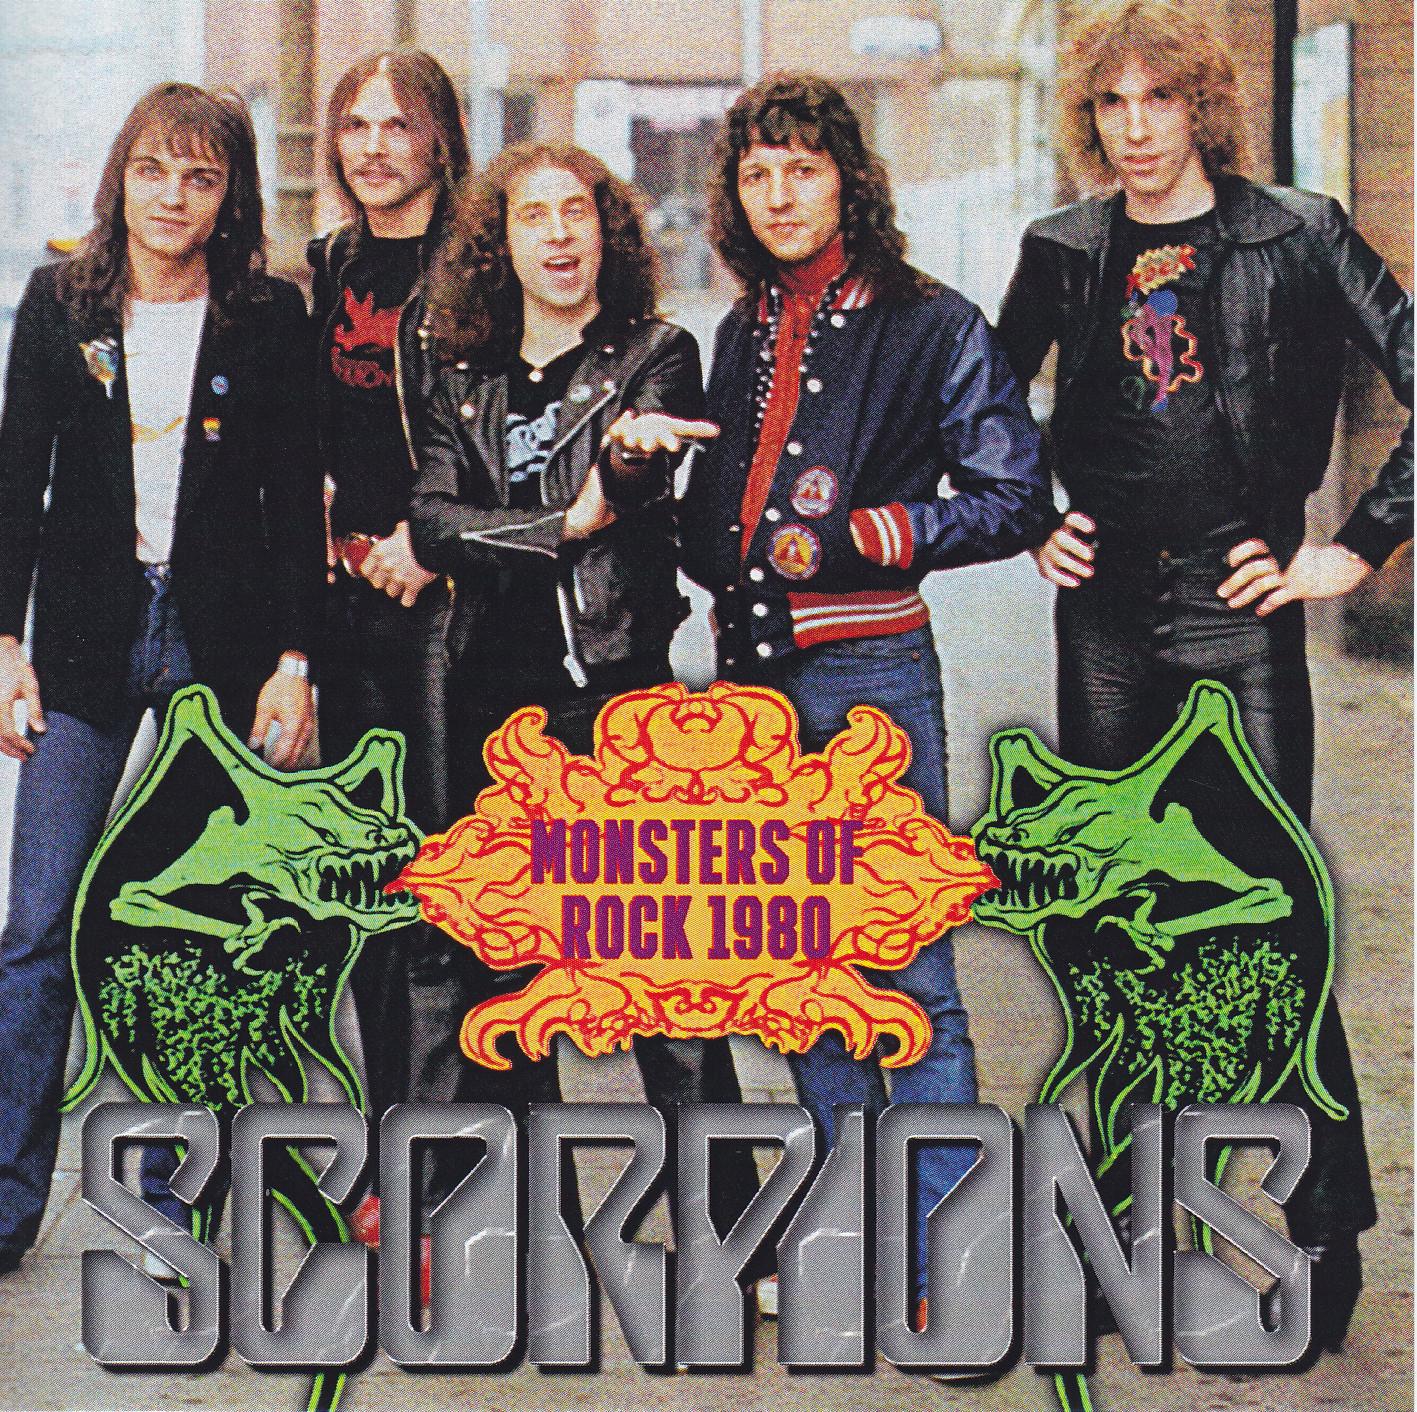 Scorpions (Ger) / Judas Priest (UK) / Saxon (UK) - Live at Monsters